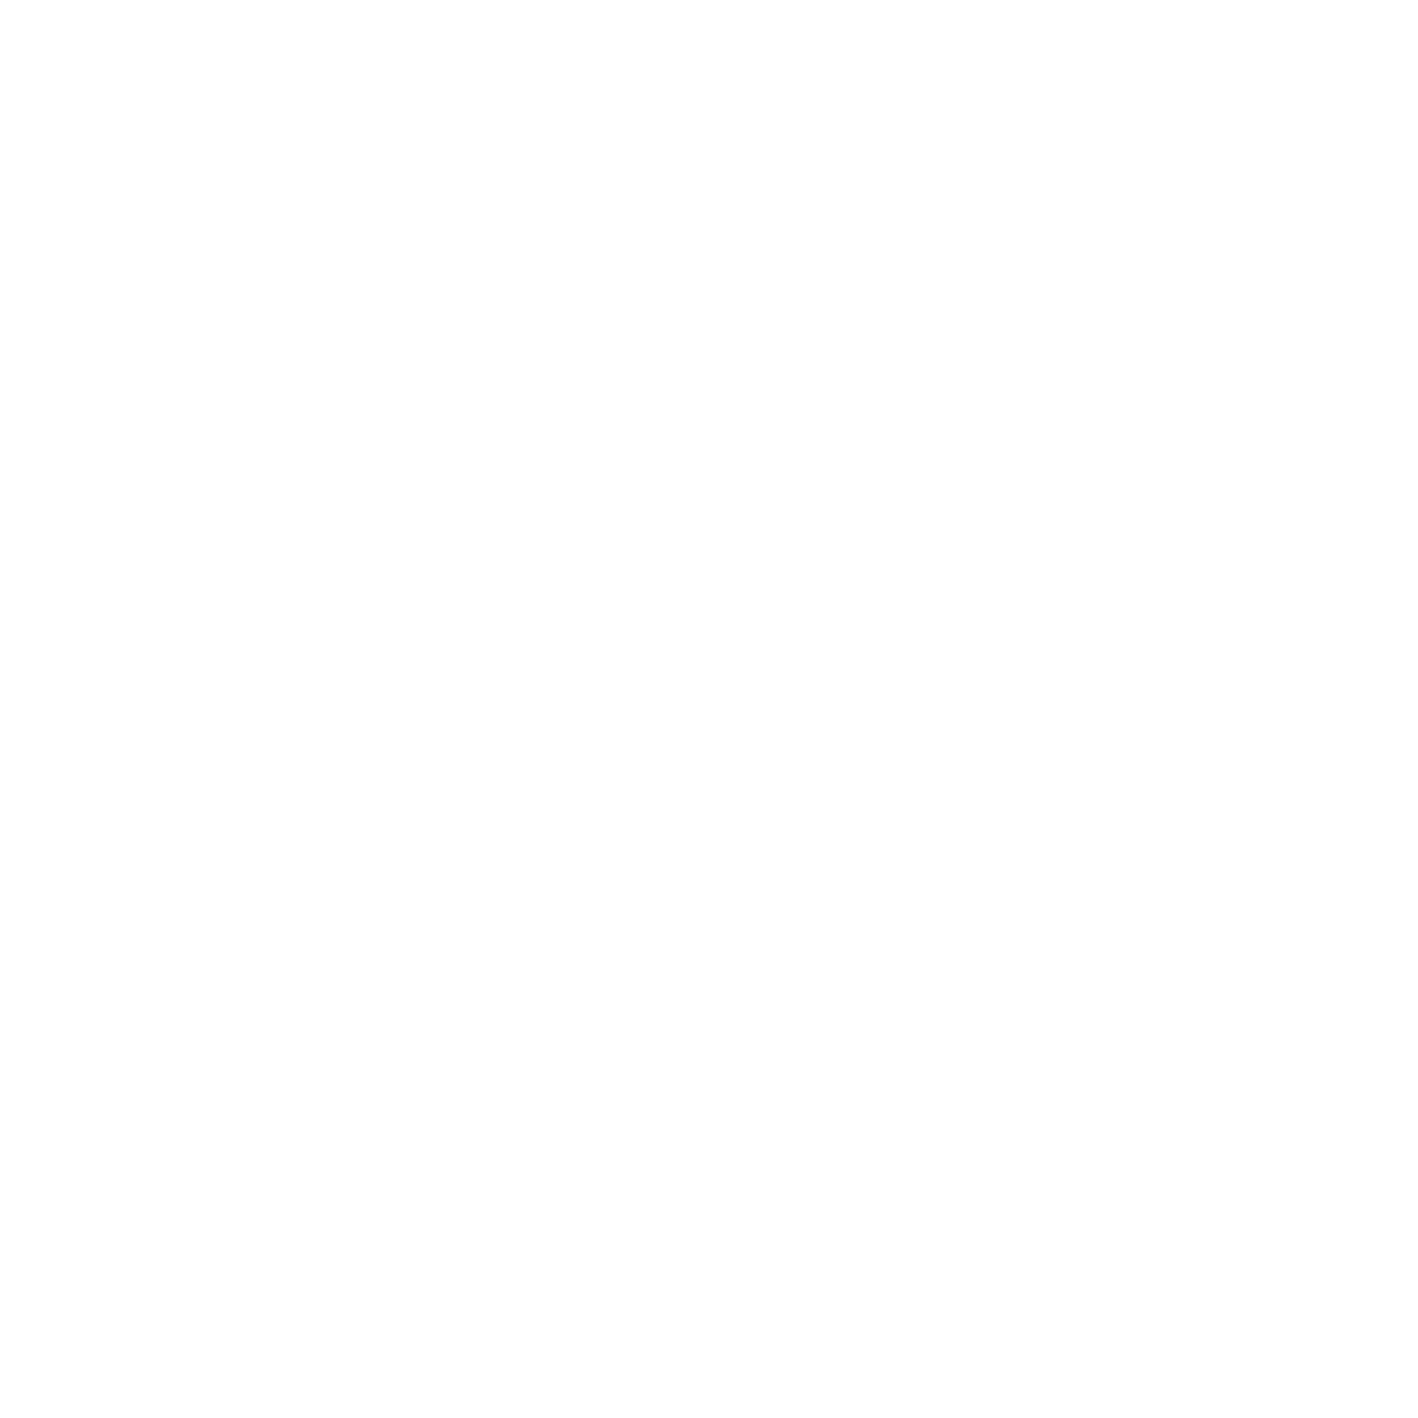 indy restaurant logo blanc